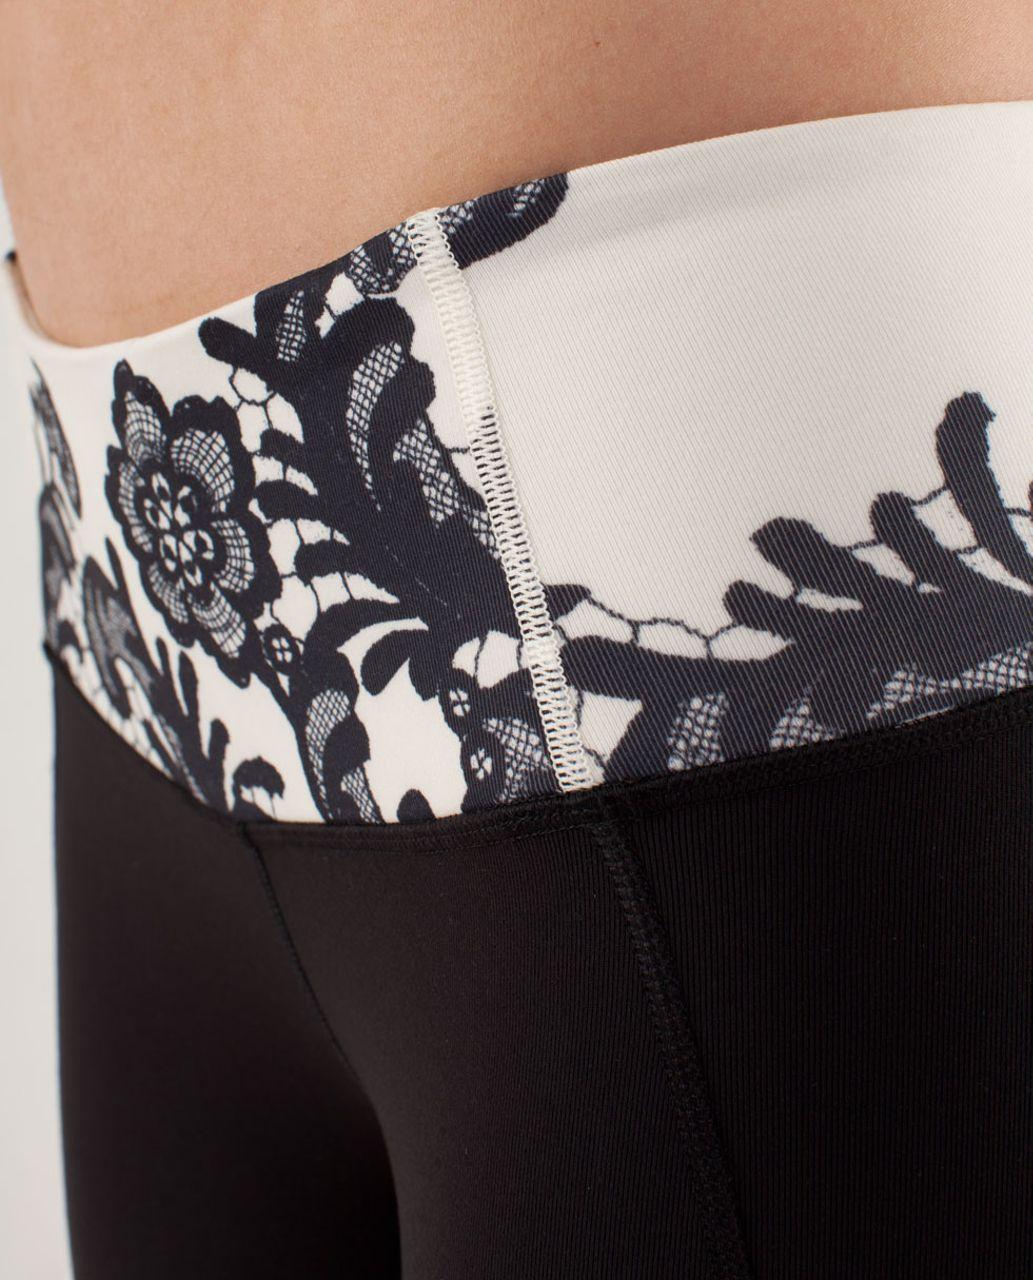 Lululemon Gather & Crow Crop - Black / Laceoflage Polar Cream Black / Polar Cream